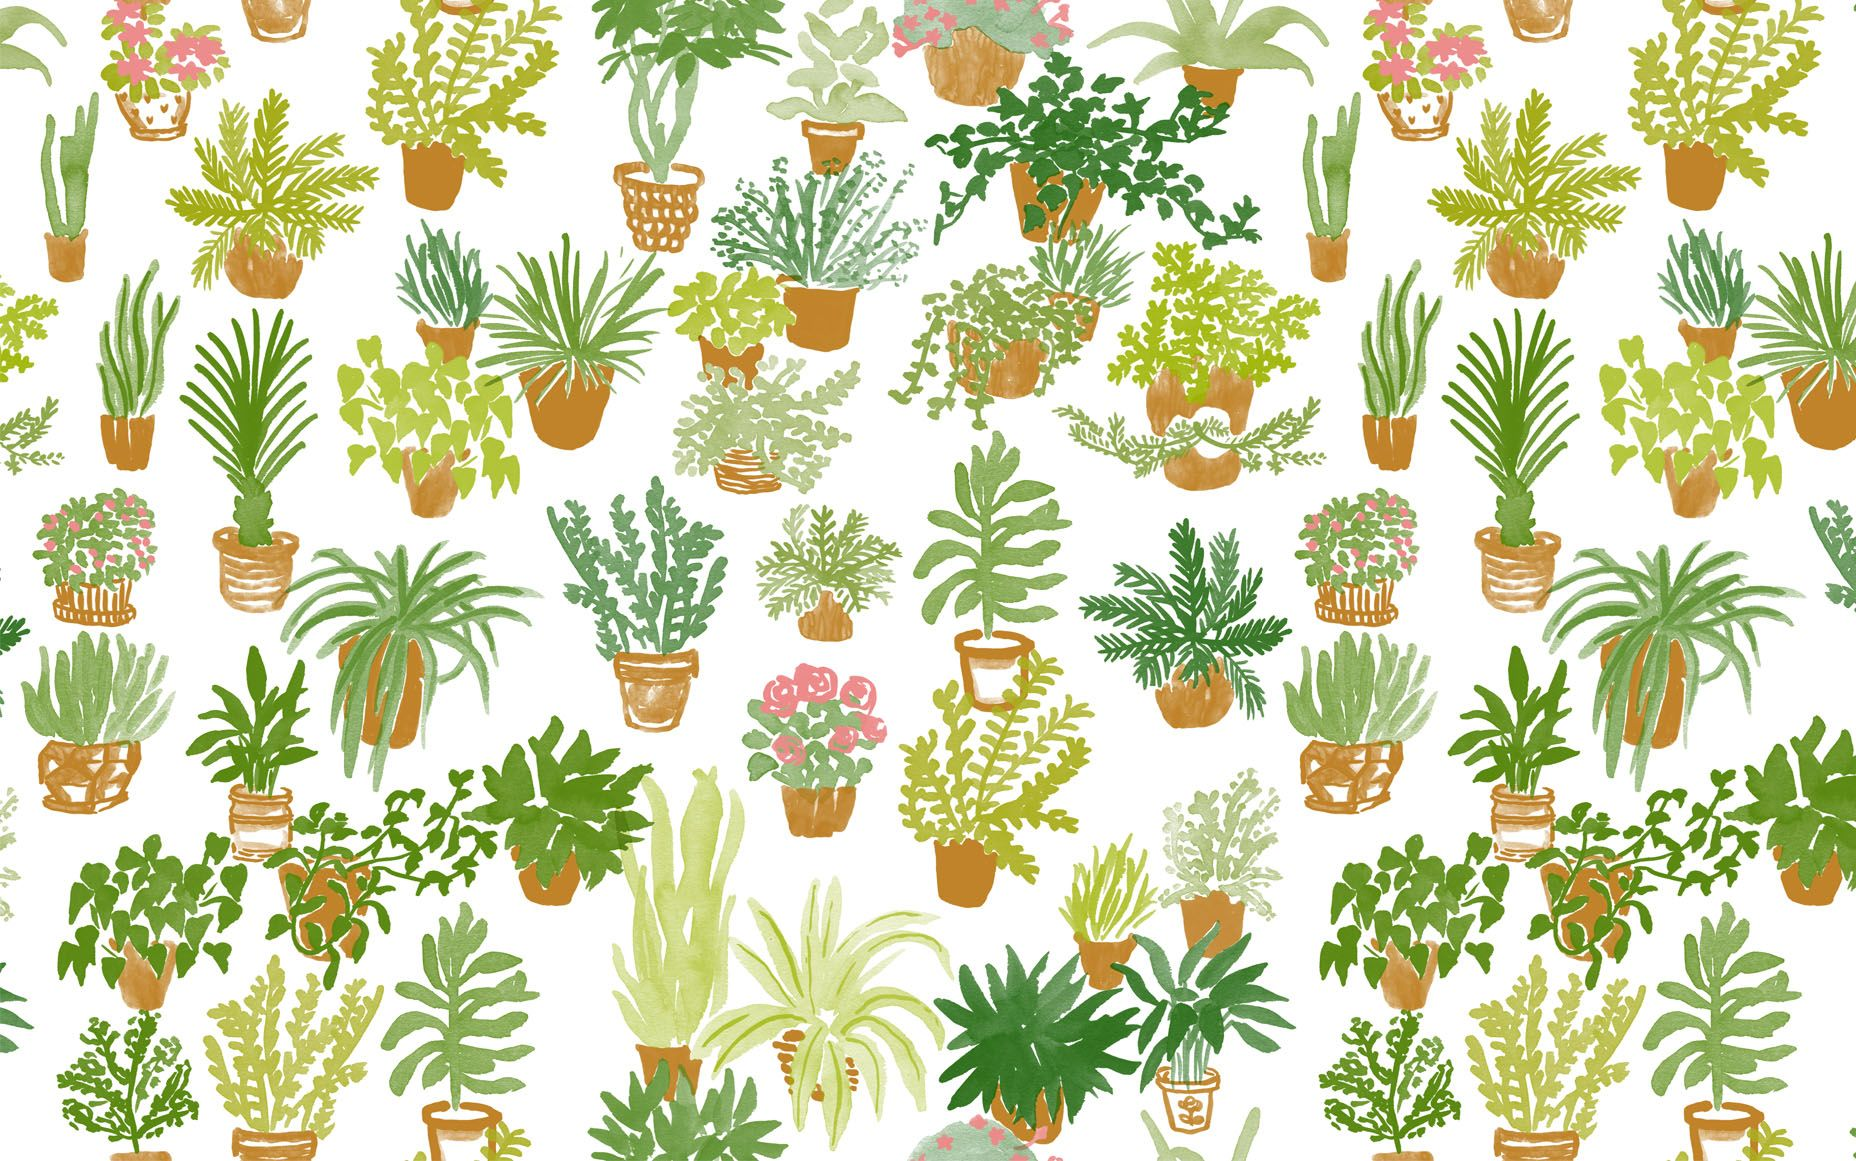 Plants Tumblr Wallpapers Wallpaper Cave